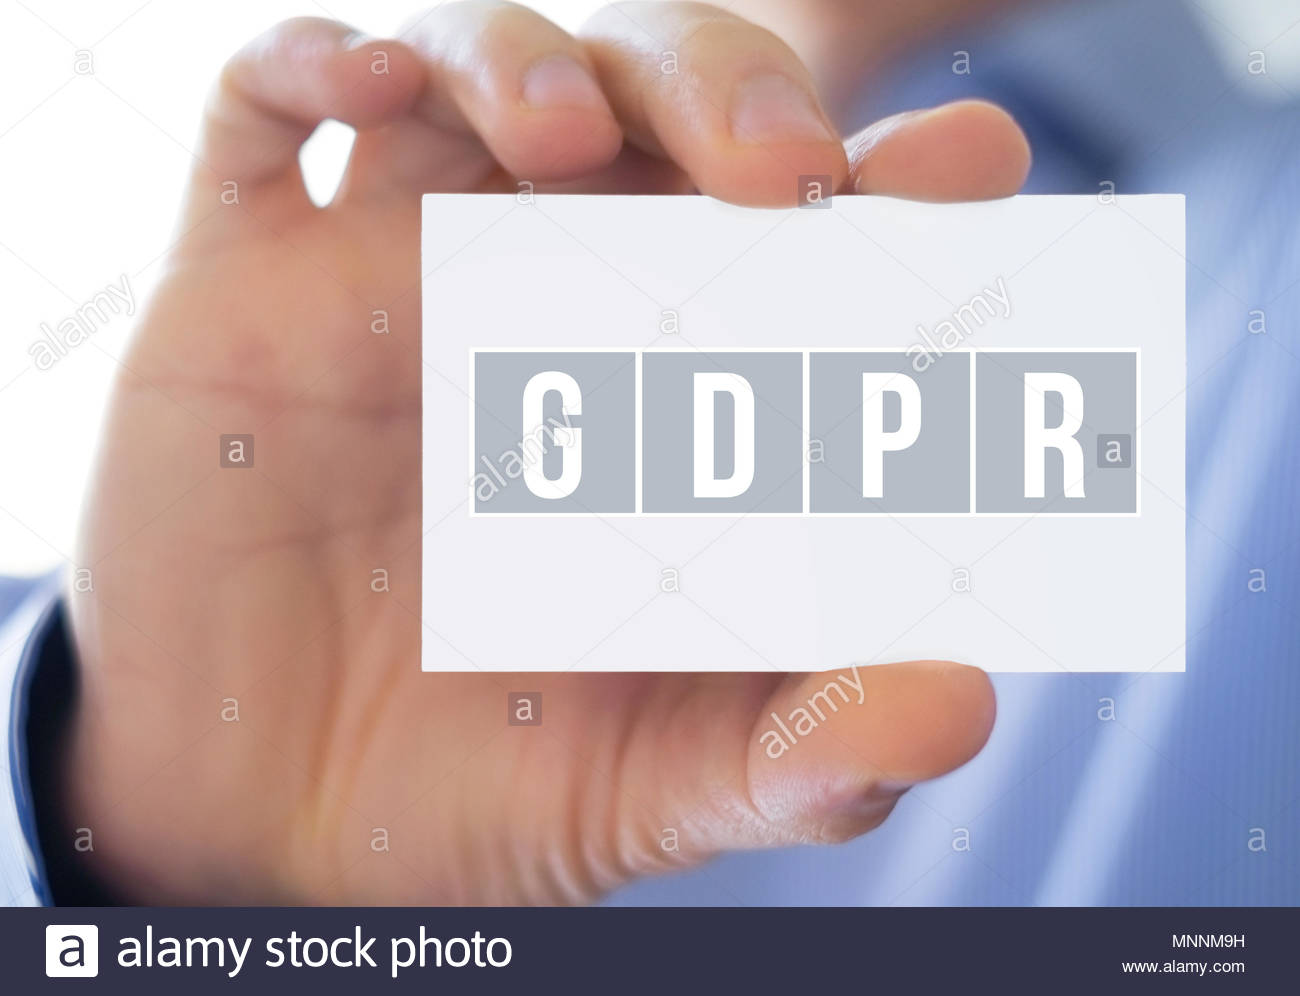 GDPR - General Data Protection Regulation - Stock Image